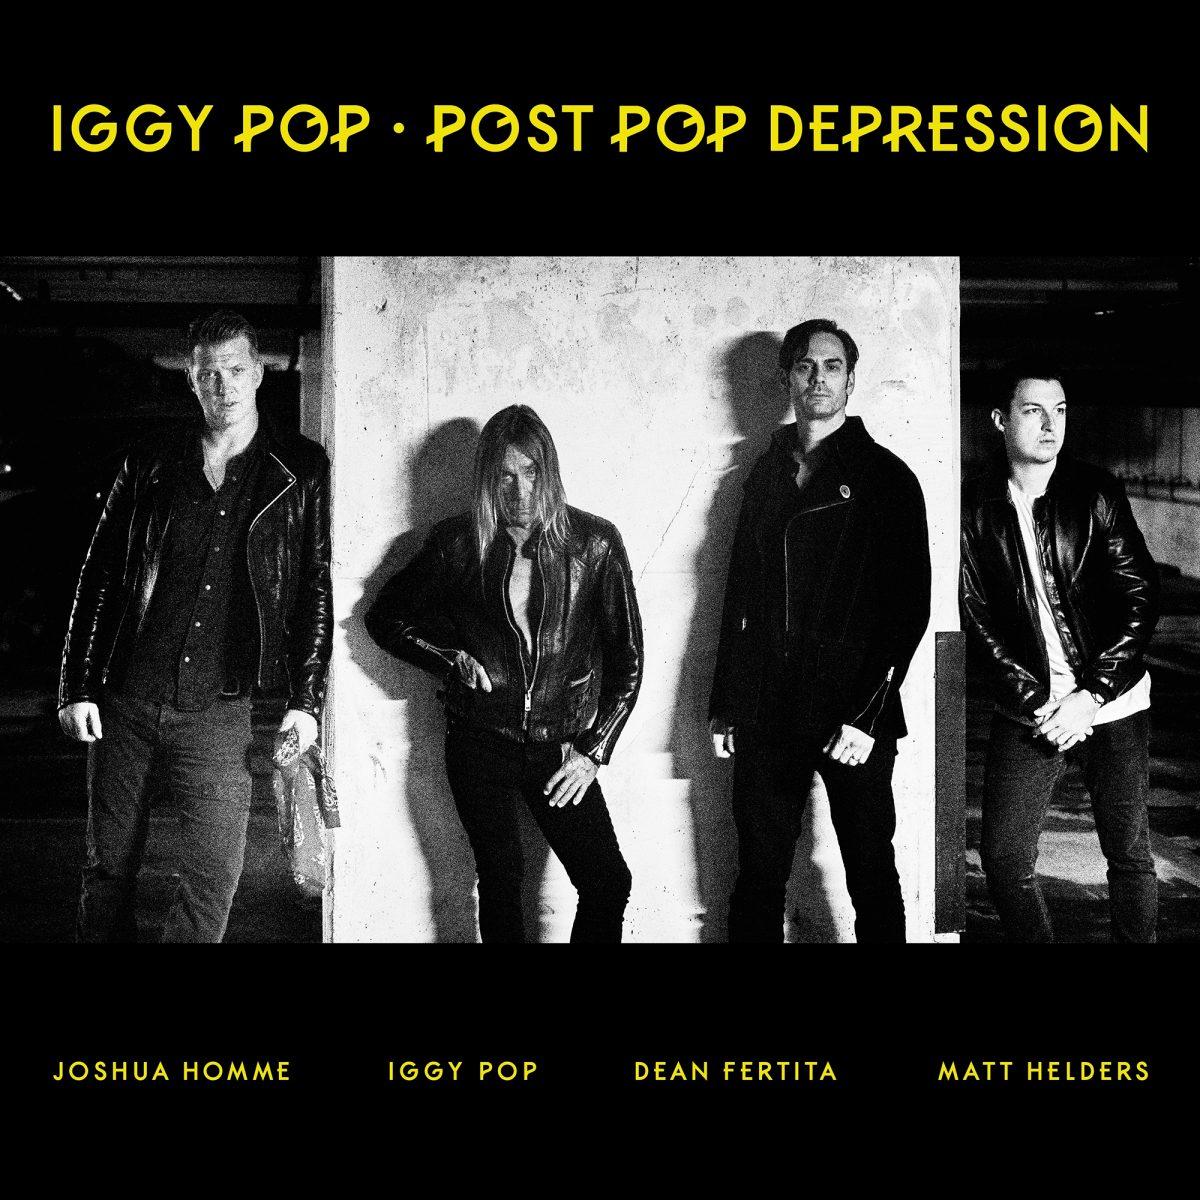 Pop, Iggy: Post Pop Depression (2016)